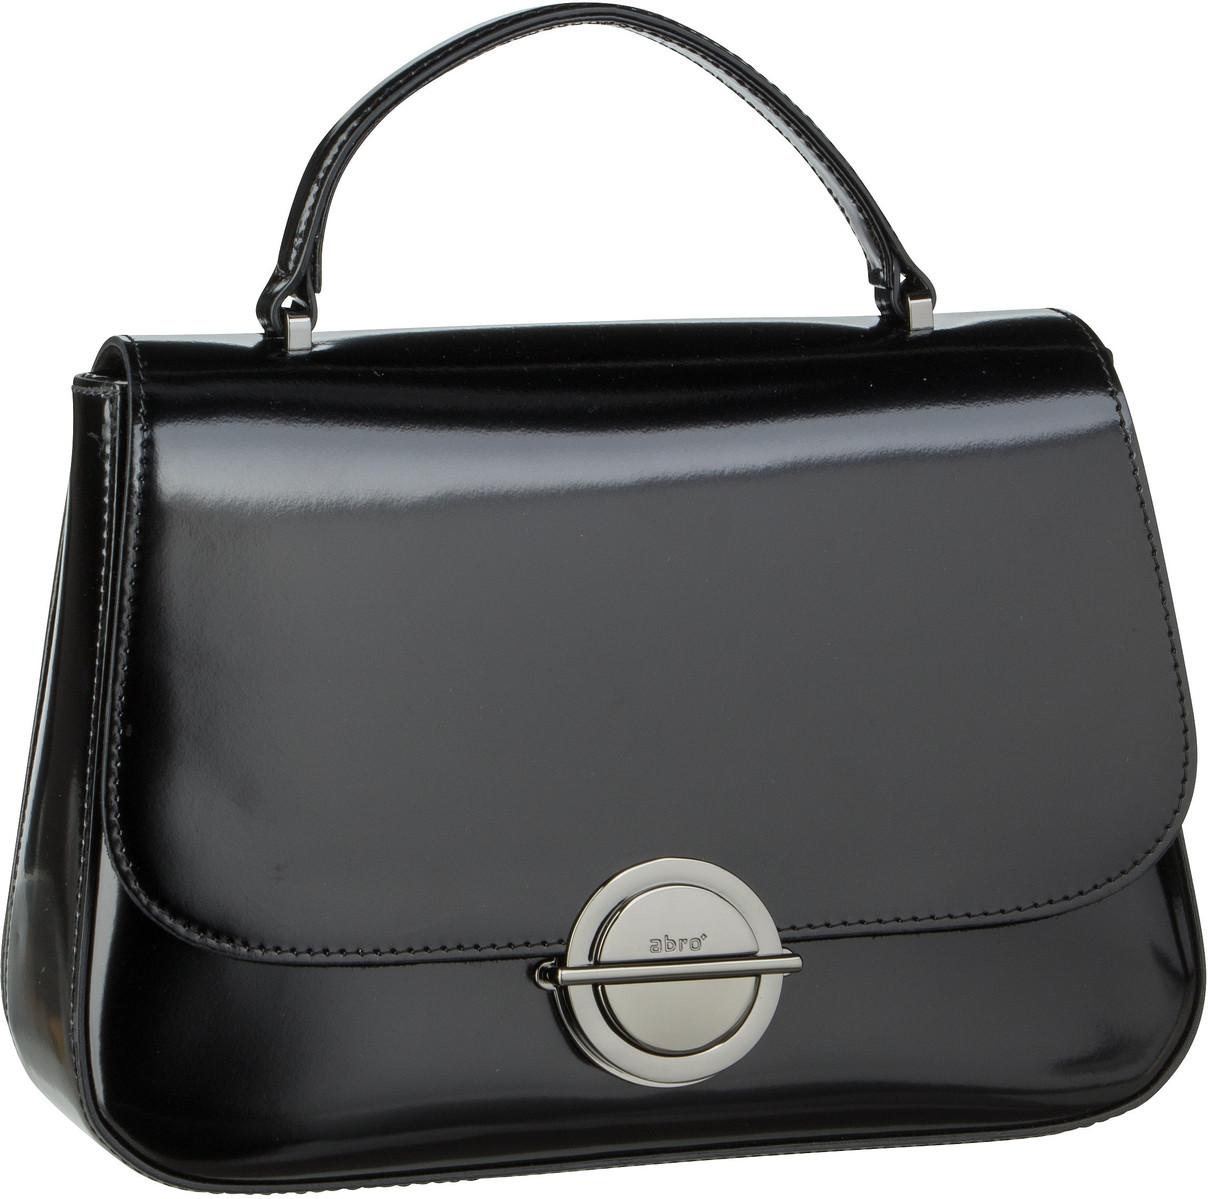 Handtasche Specchio 28646 Black/Guncolor